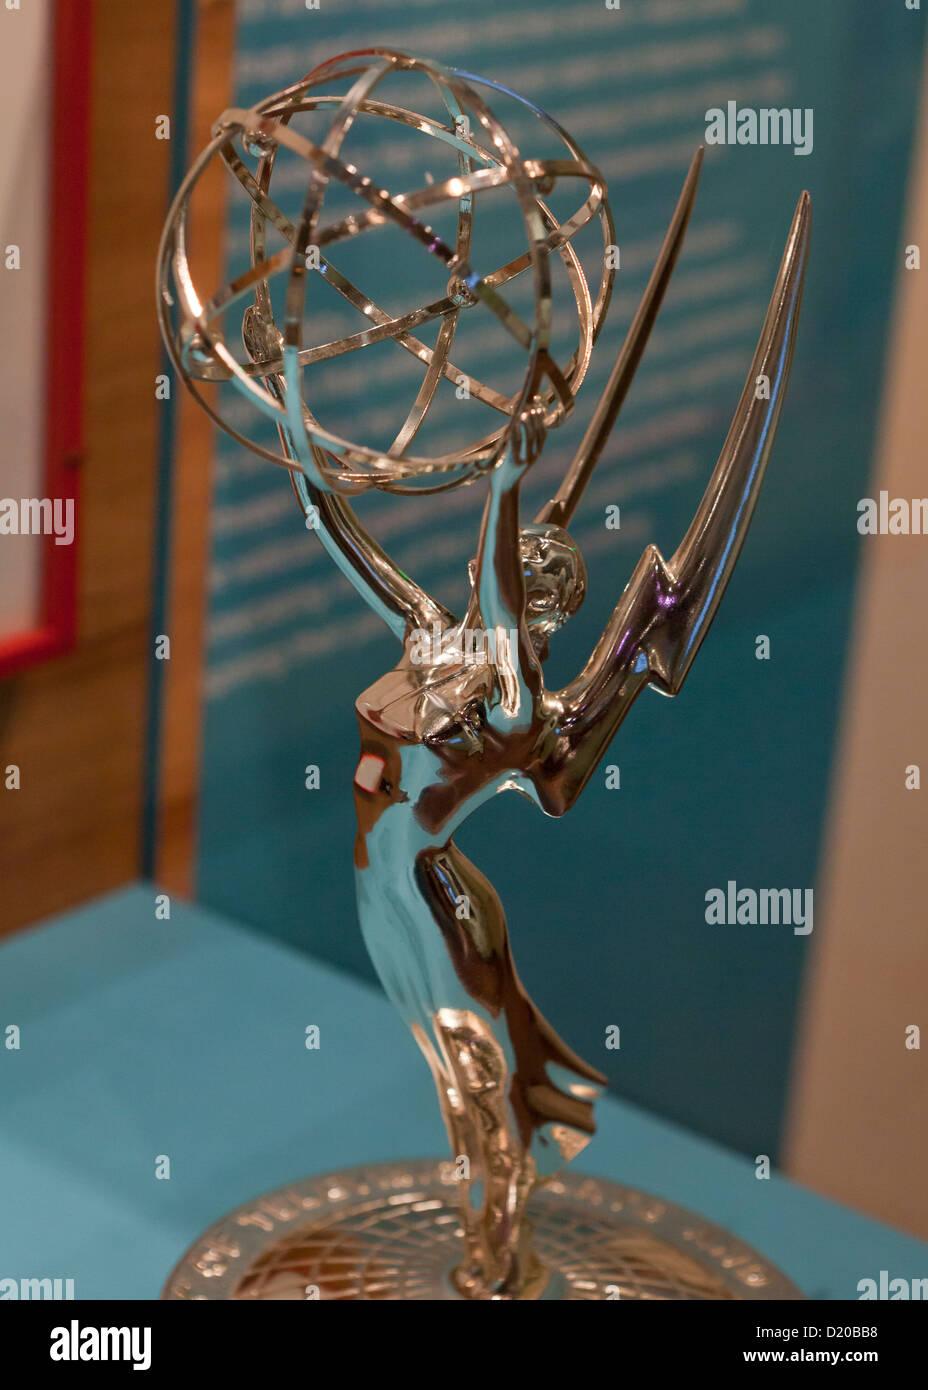 Emmy Award trophy - Stock Image